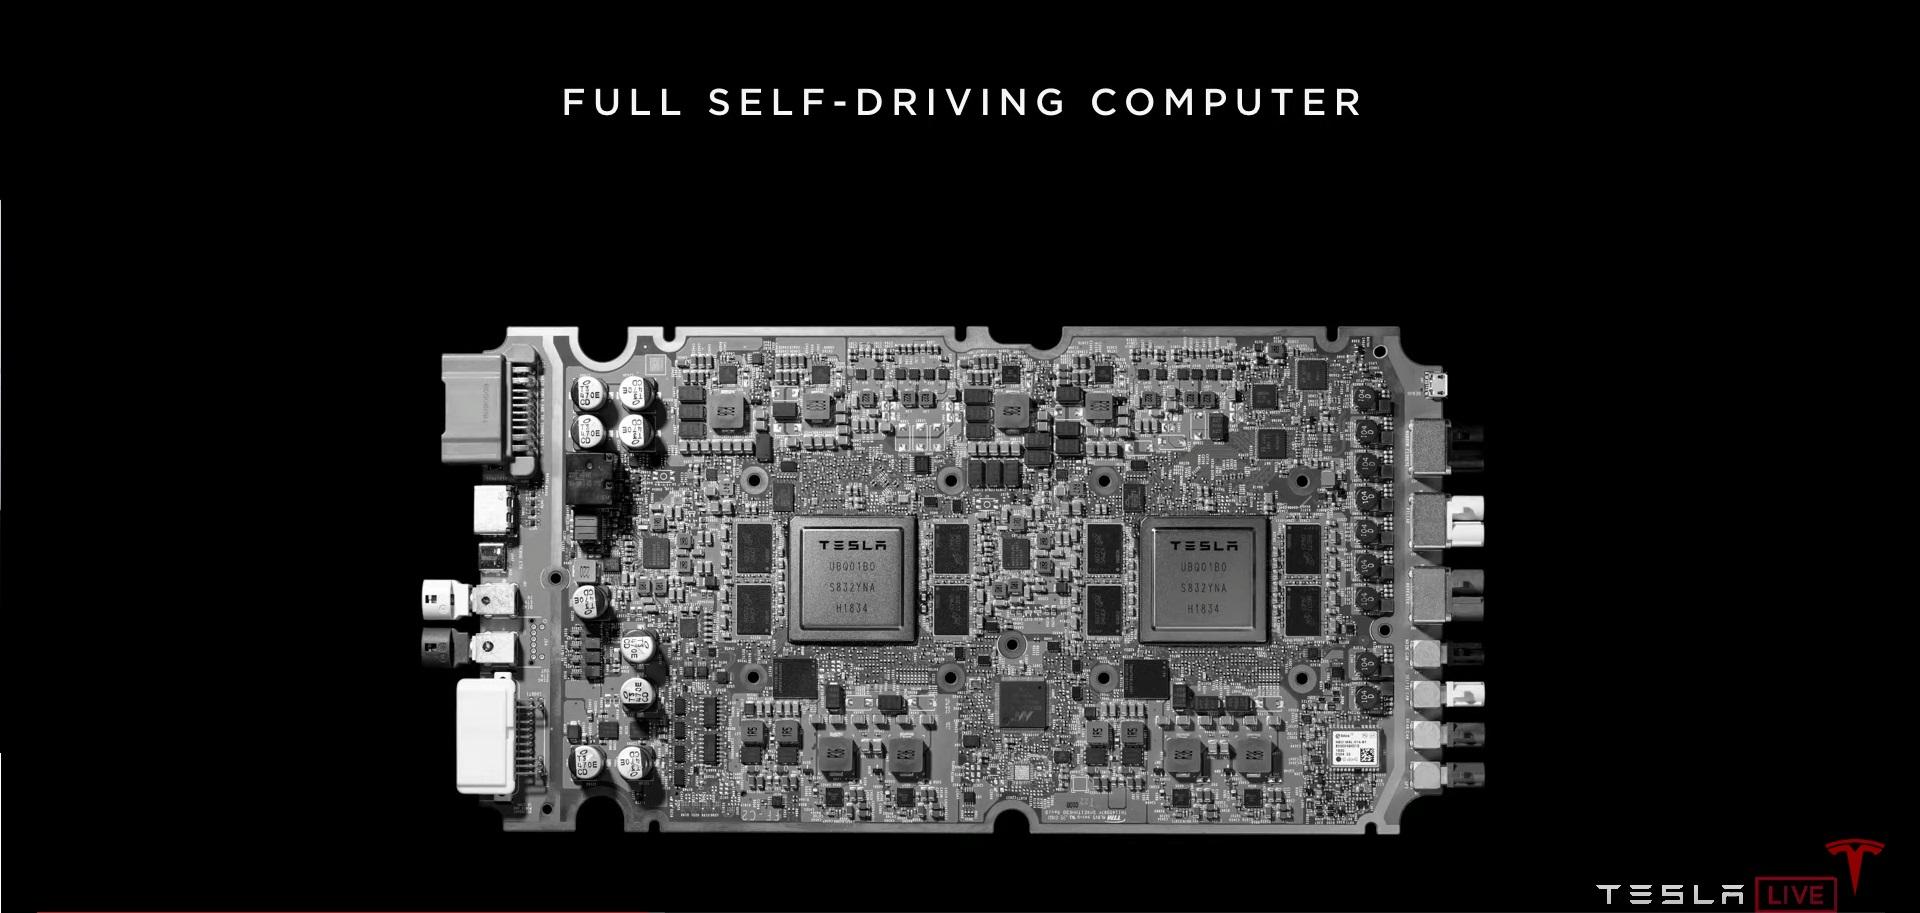 Tesla_Self-driving-computer